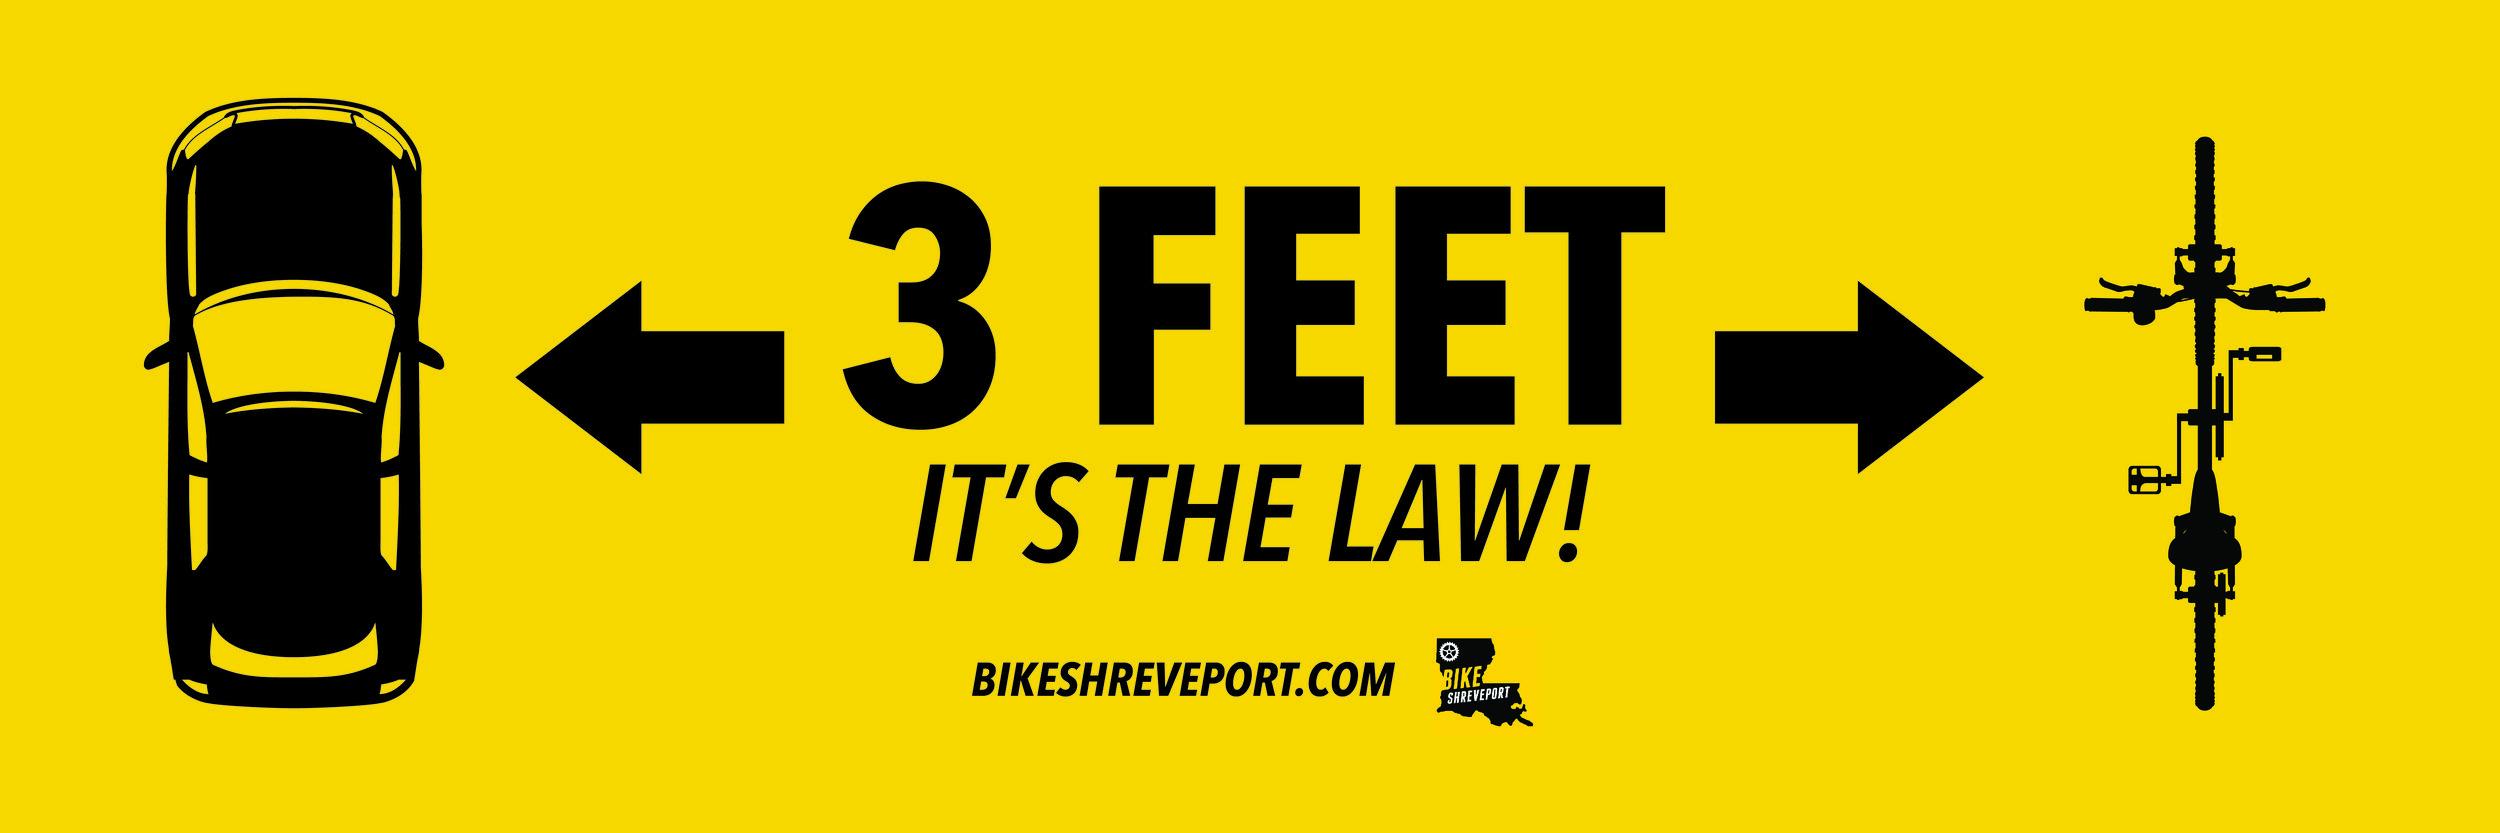 Figure 2: Educational billboard created by Bike Shreveport.